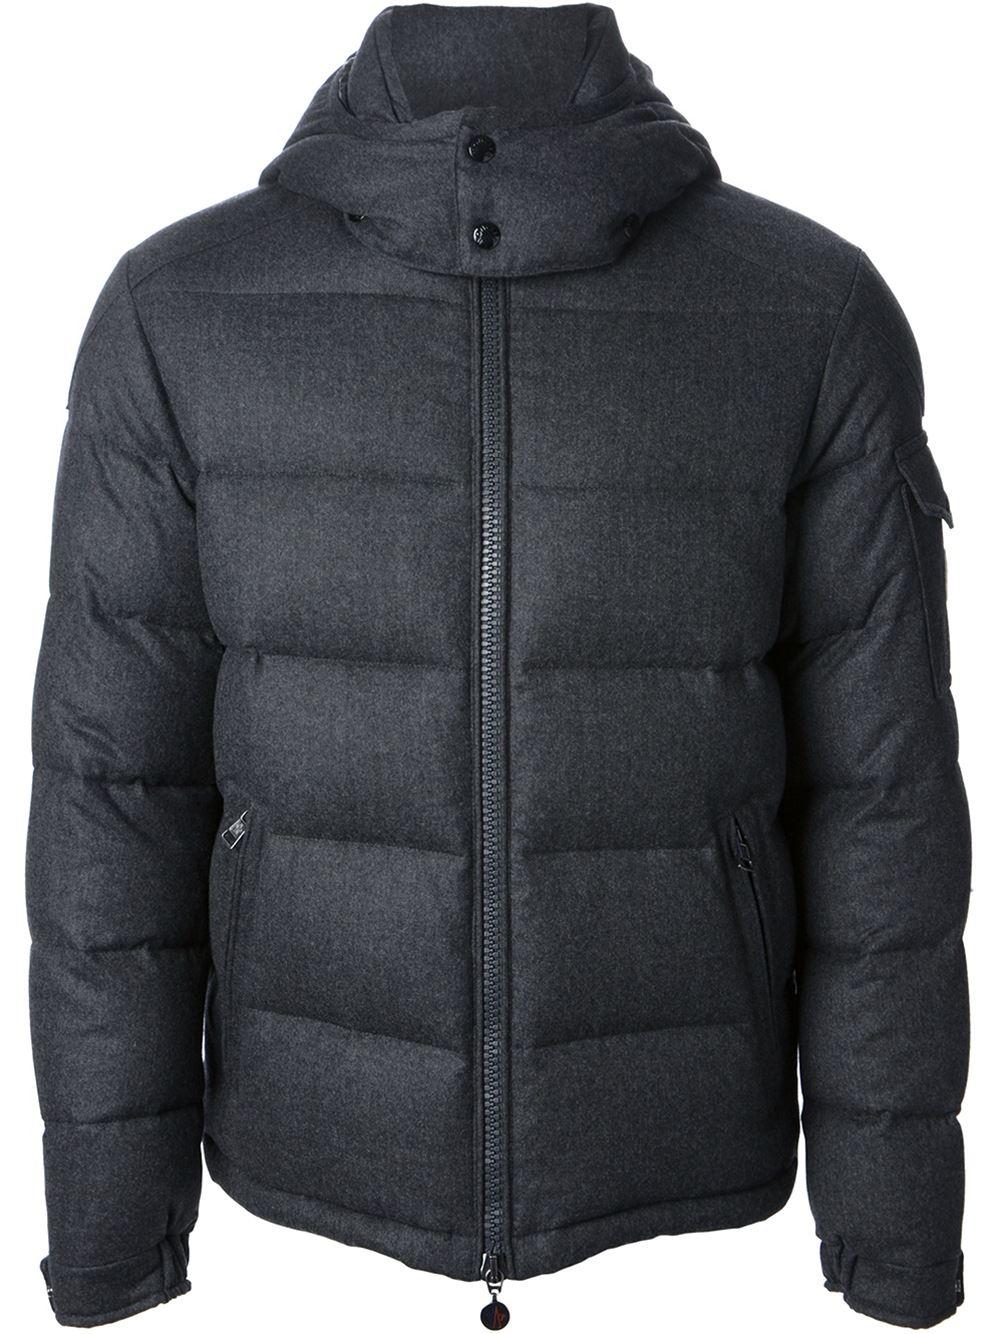 Moncler Montgenevre Jacket In Gray For Men Lyst